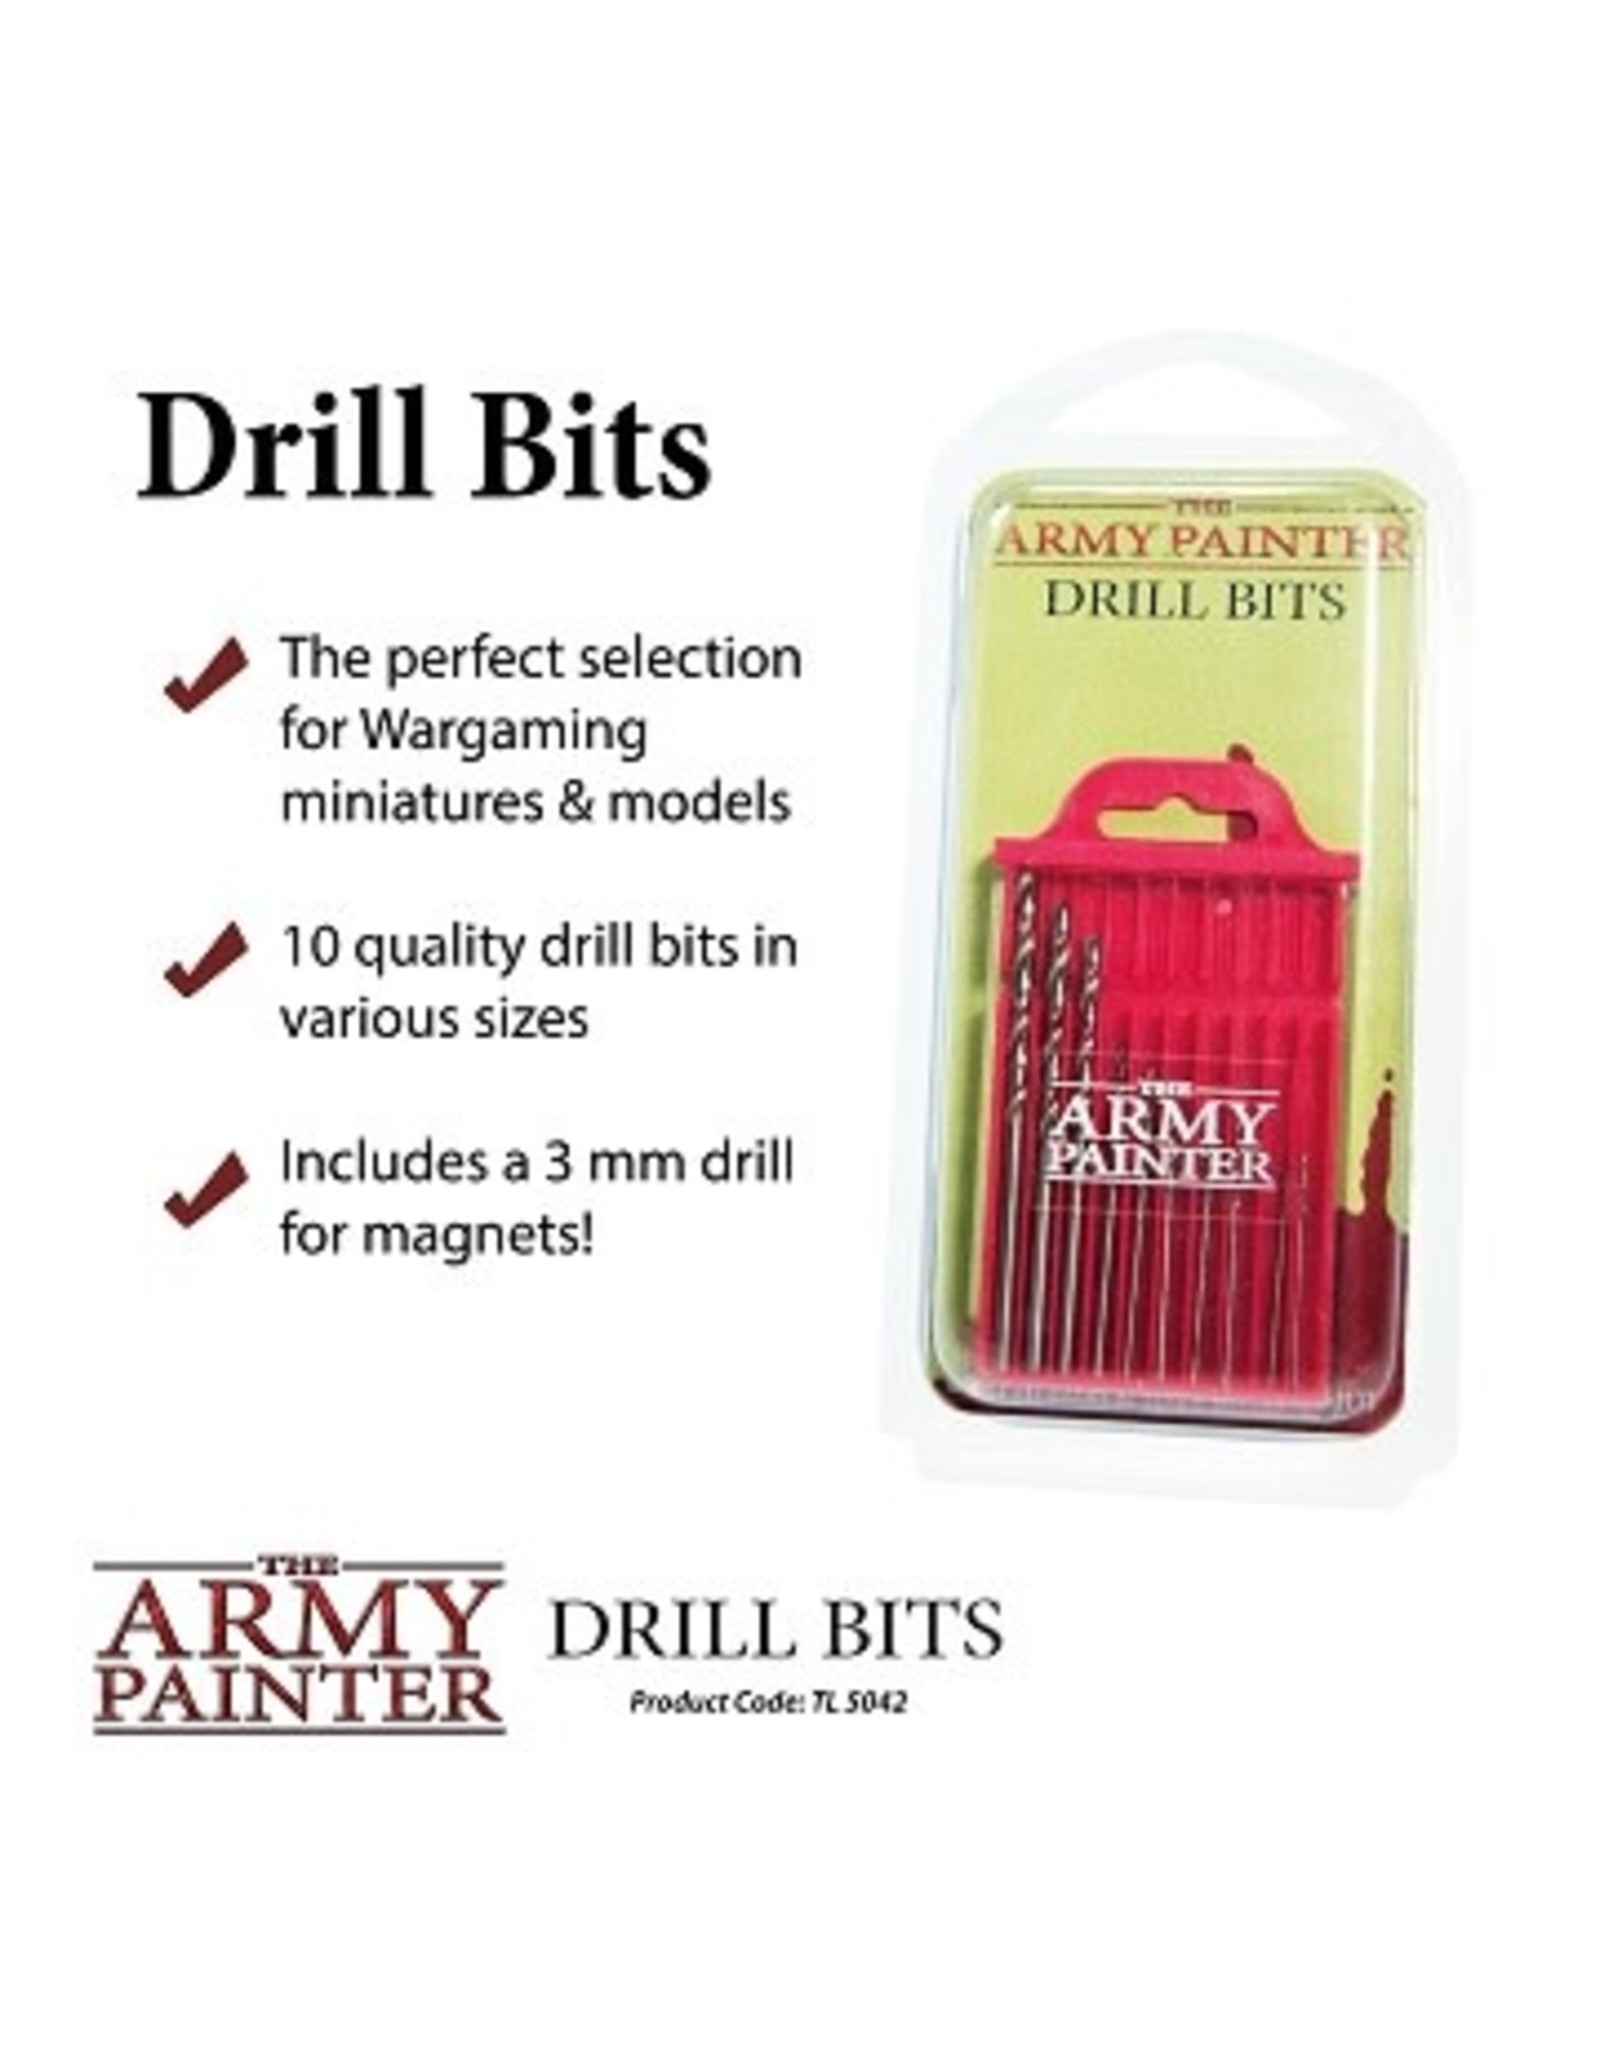 Army Painter MINIATURE & MODEL TOOLS: DRILL BITS